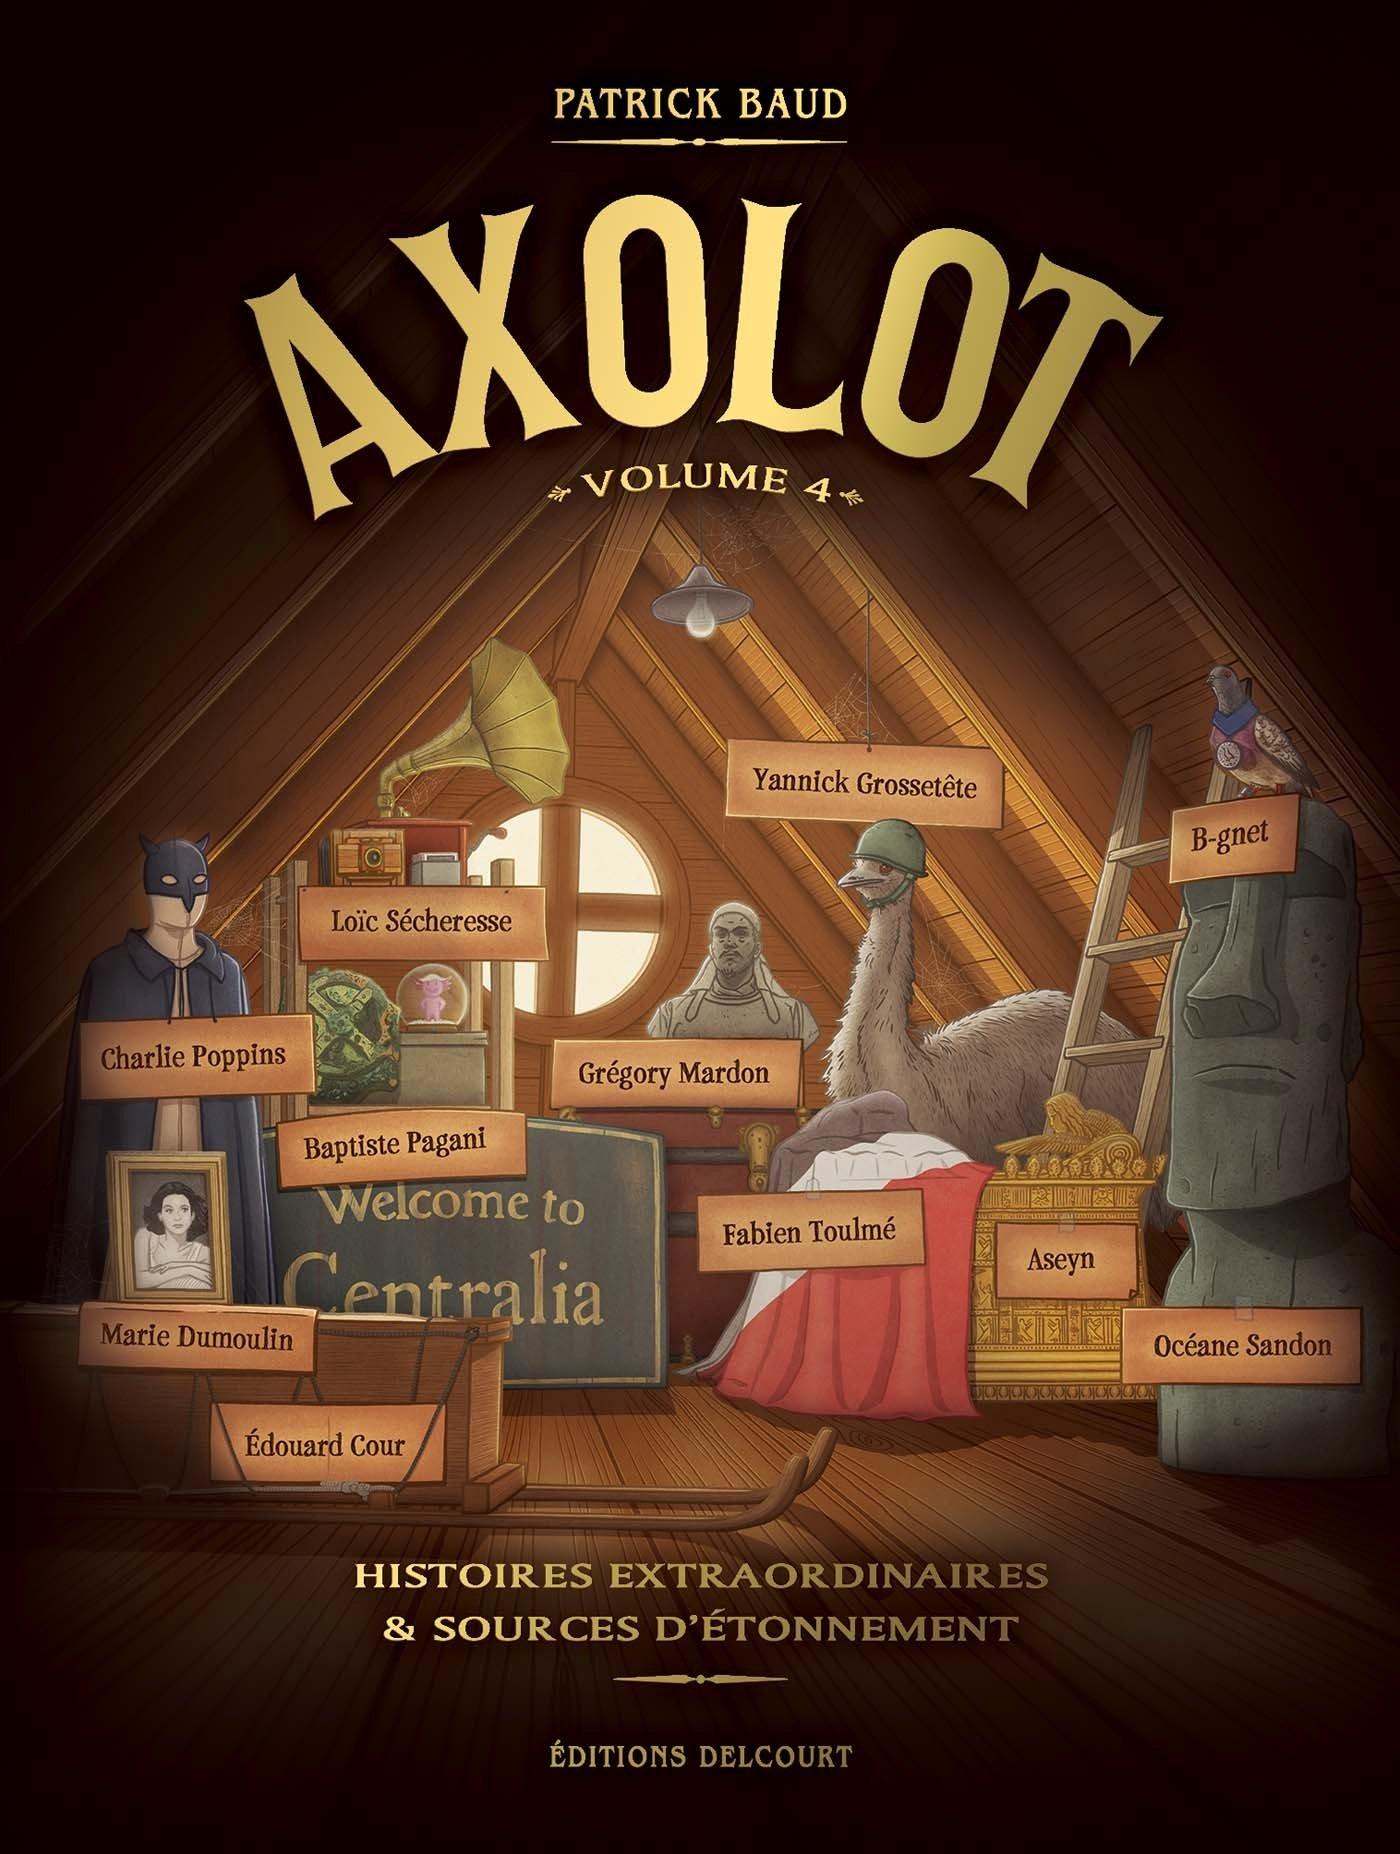 Axolot 4 - Volume 4